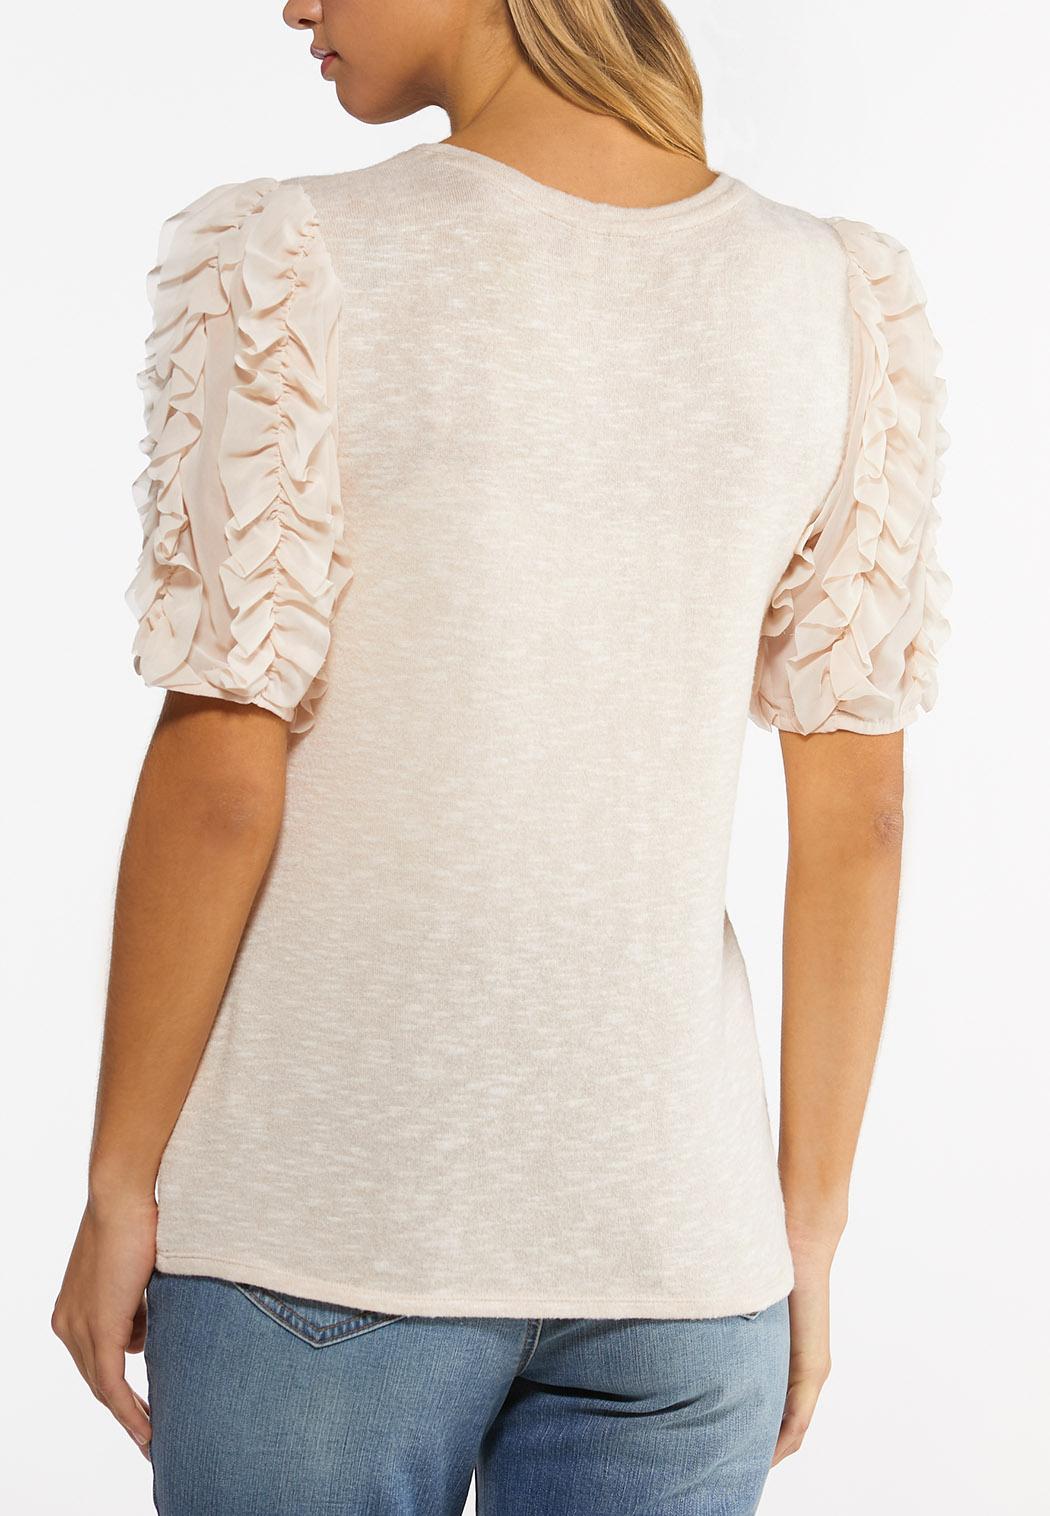 Petal Sleeve Top (Item #44486821)